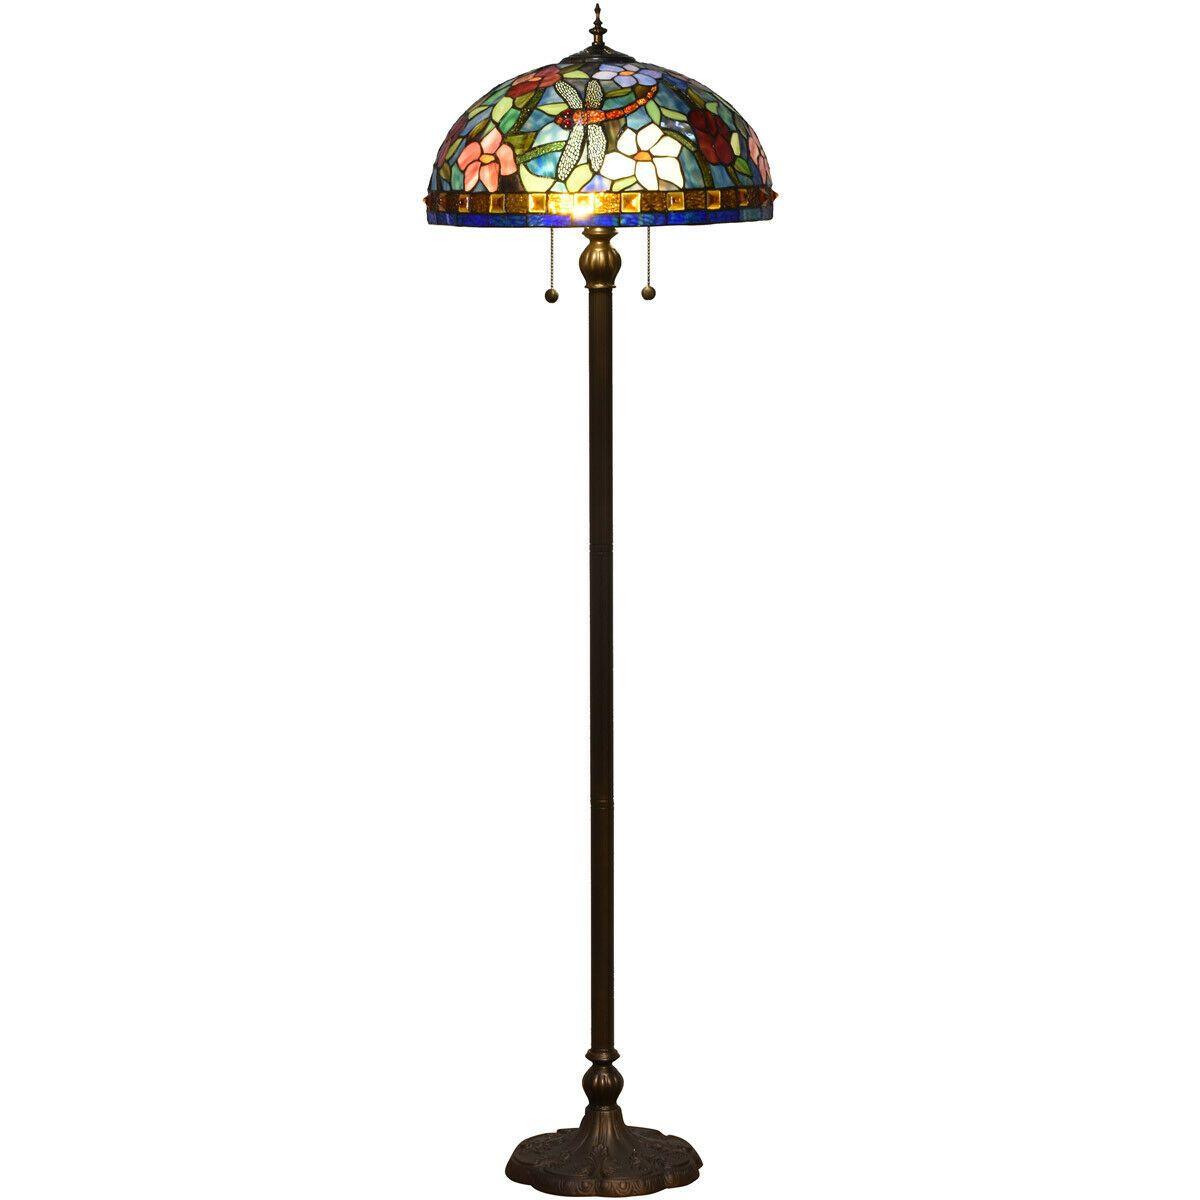 Dale Tiffany Tf16085 Josef Floor Lamp Antique Bronze Tiffany Lamps Ideas Of Tiffany Lamps Tiffanylamps Lamps Lamp Dale Tiffany Floor Lamp